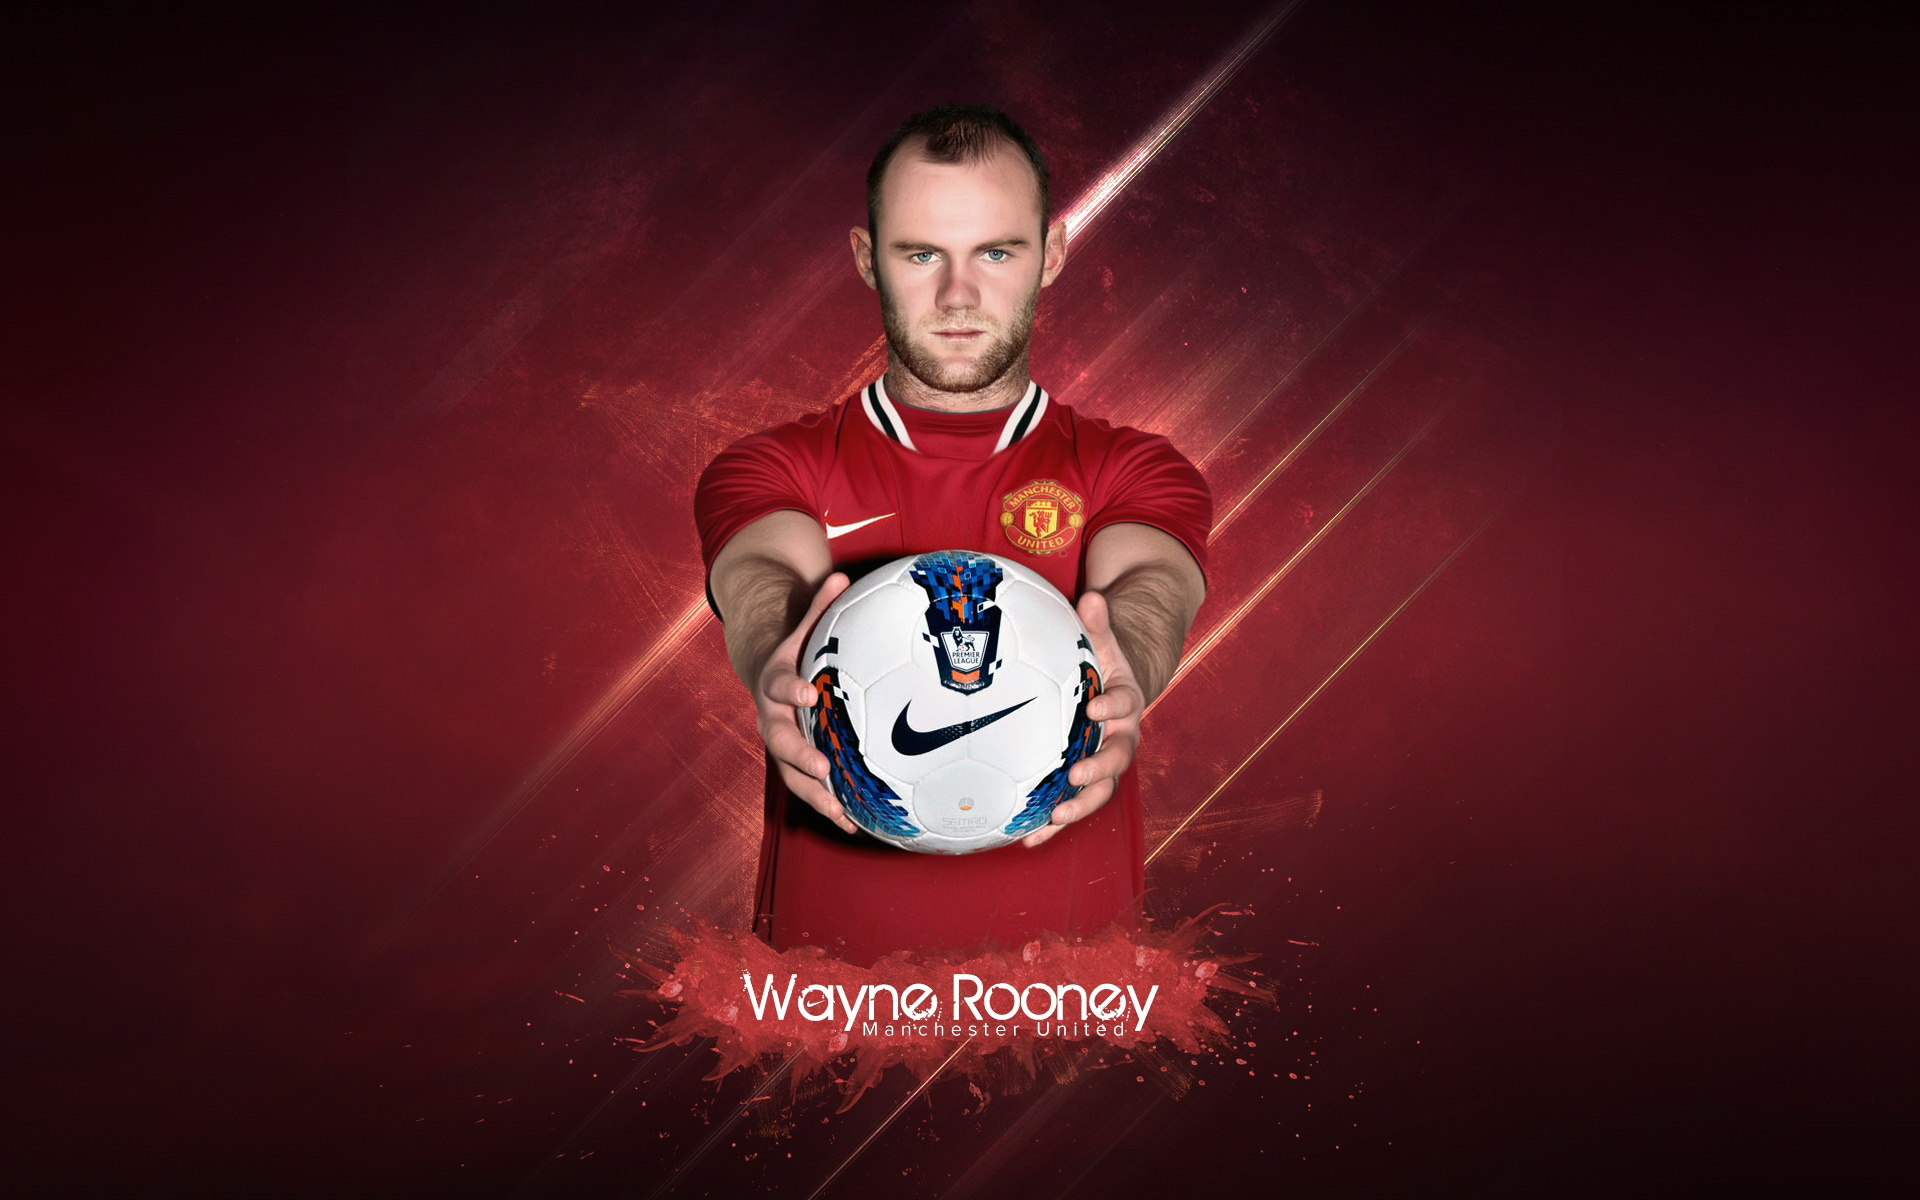 Wayne Rooney Hd Wallpaper